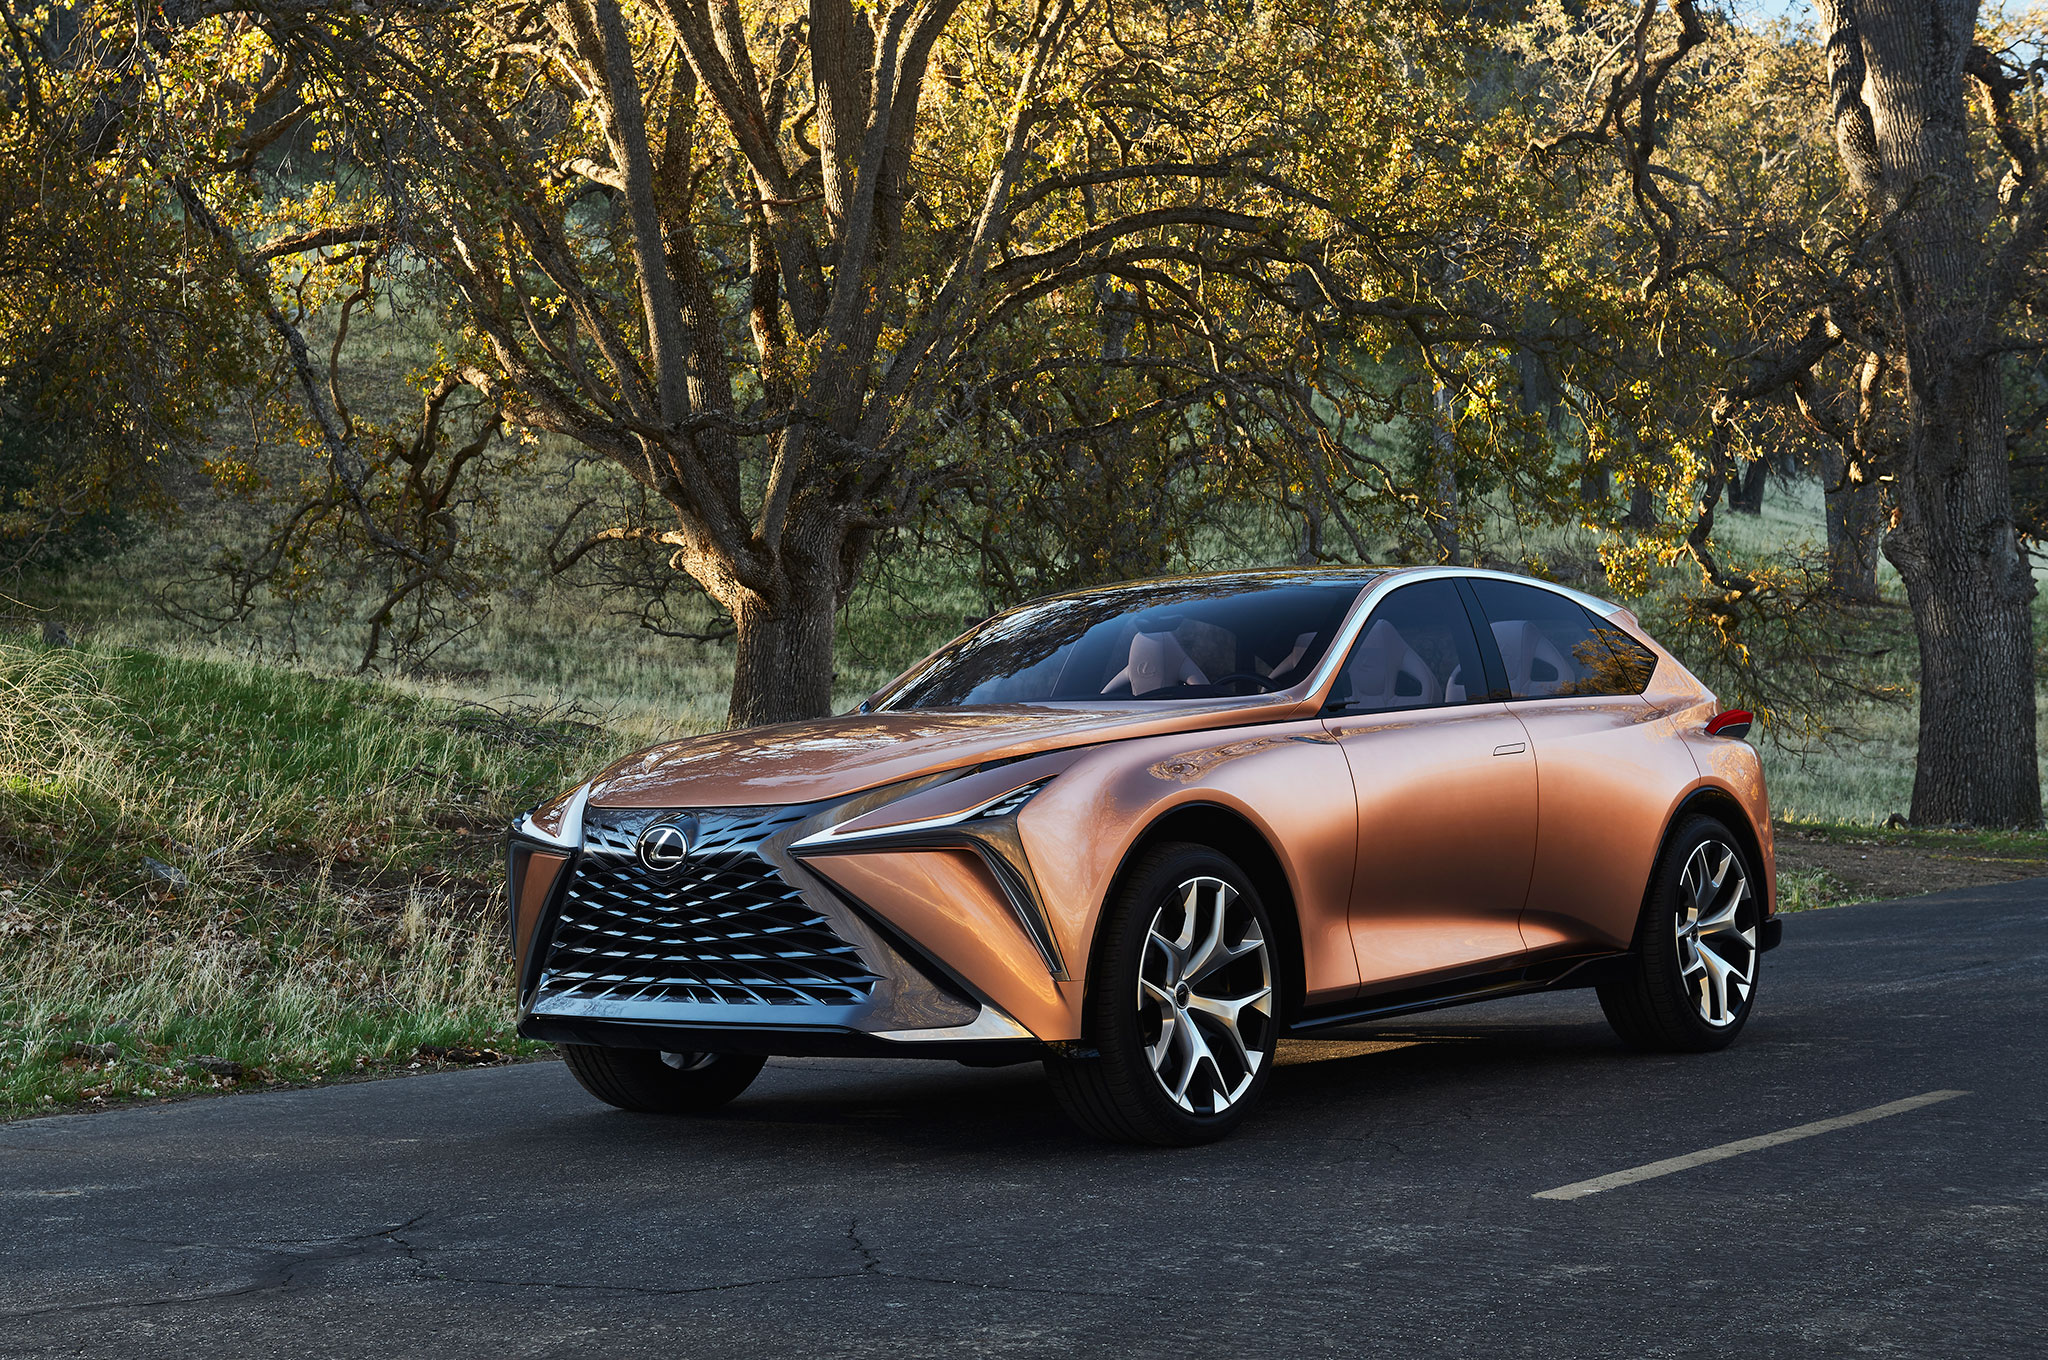 Lexus LF 1 Limitless Concept Front Side View